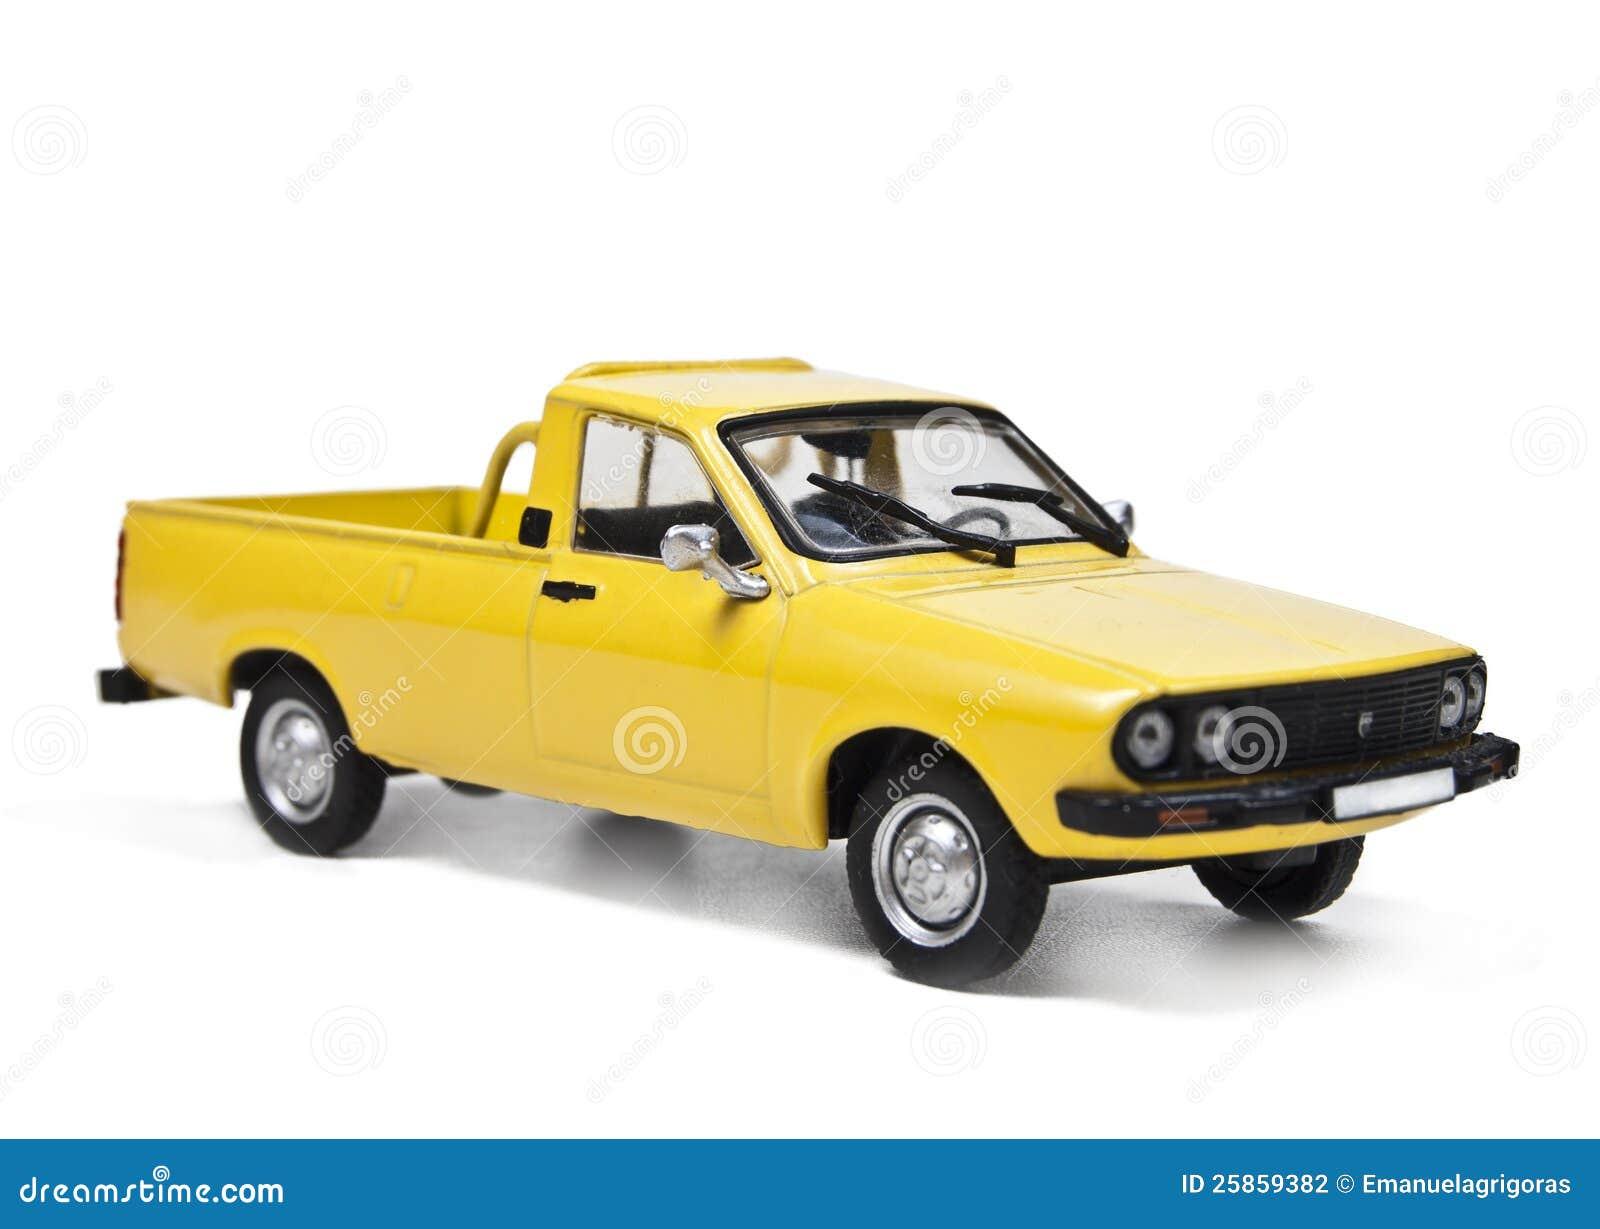 Dacia 1300 uppsamling